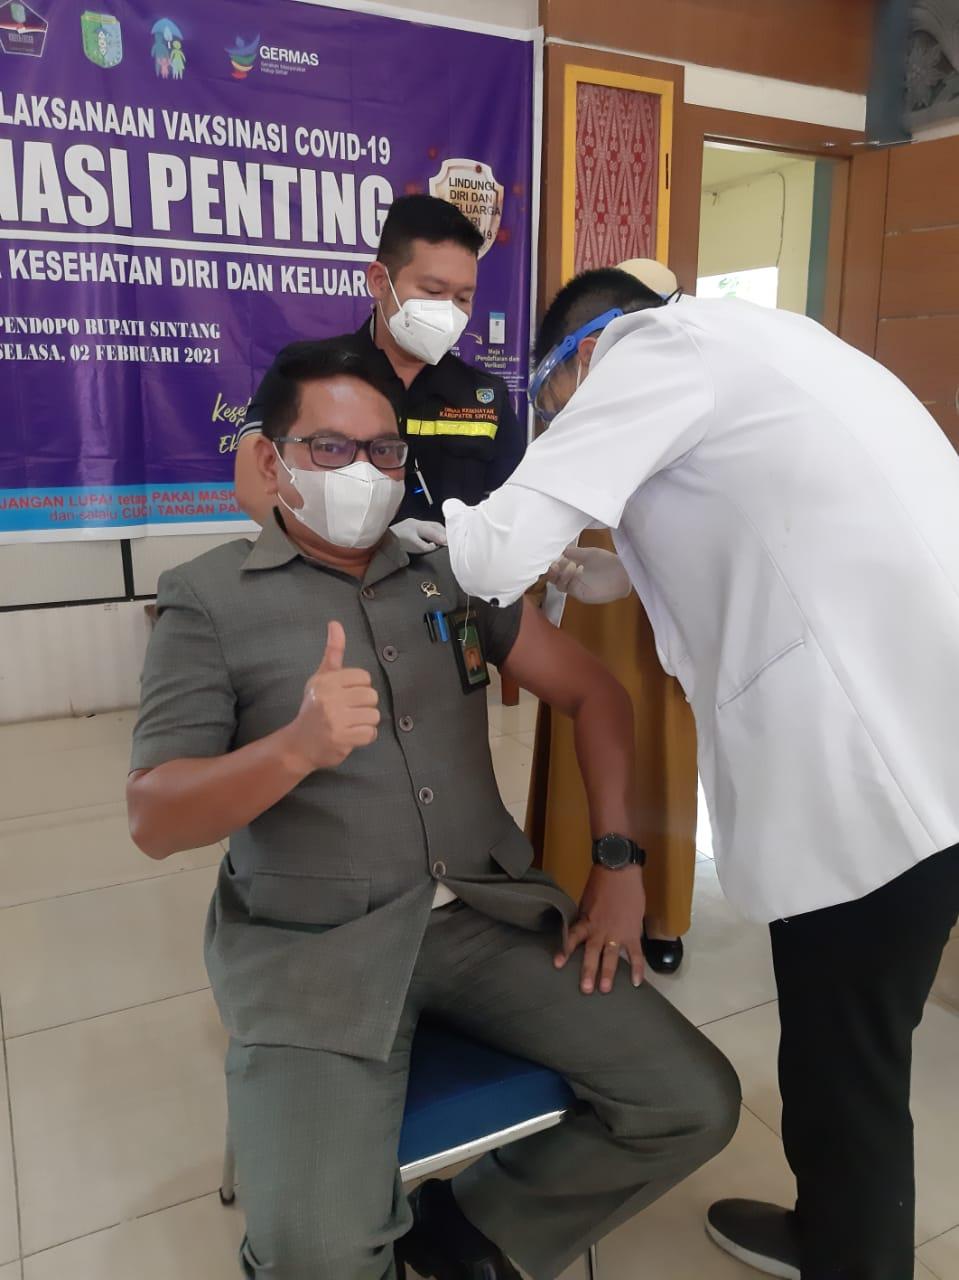 Ketua Pengadilan Negeri Sintang Mengikuti Vaksinasi Covid-19 Tahap Pertama yang diselenggarakan oleh Pemerintah Kabupaten Sintang